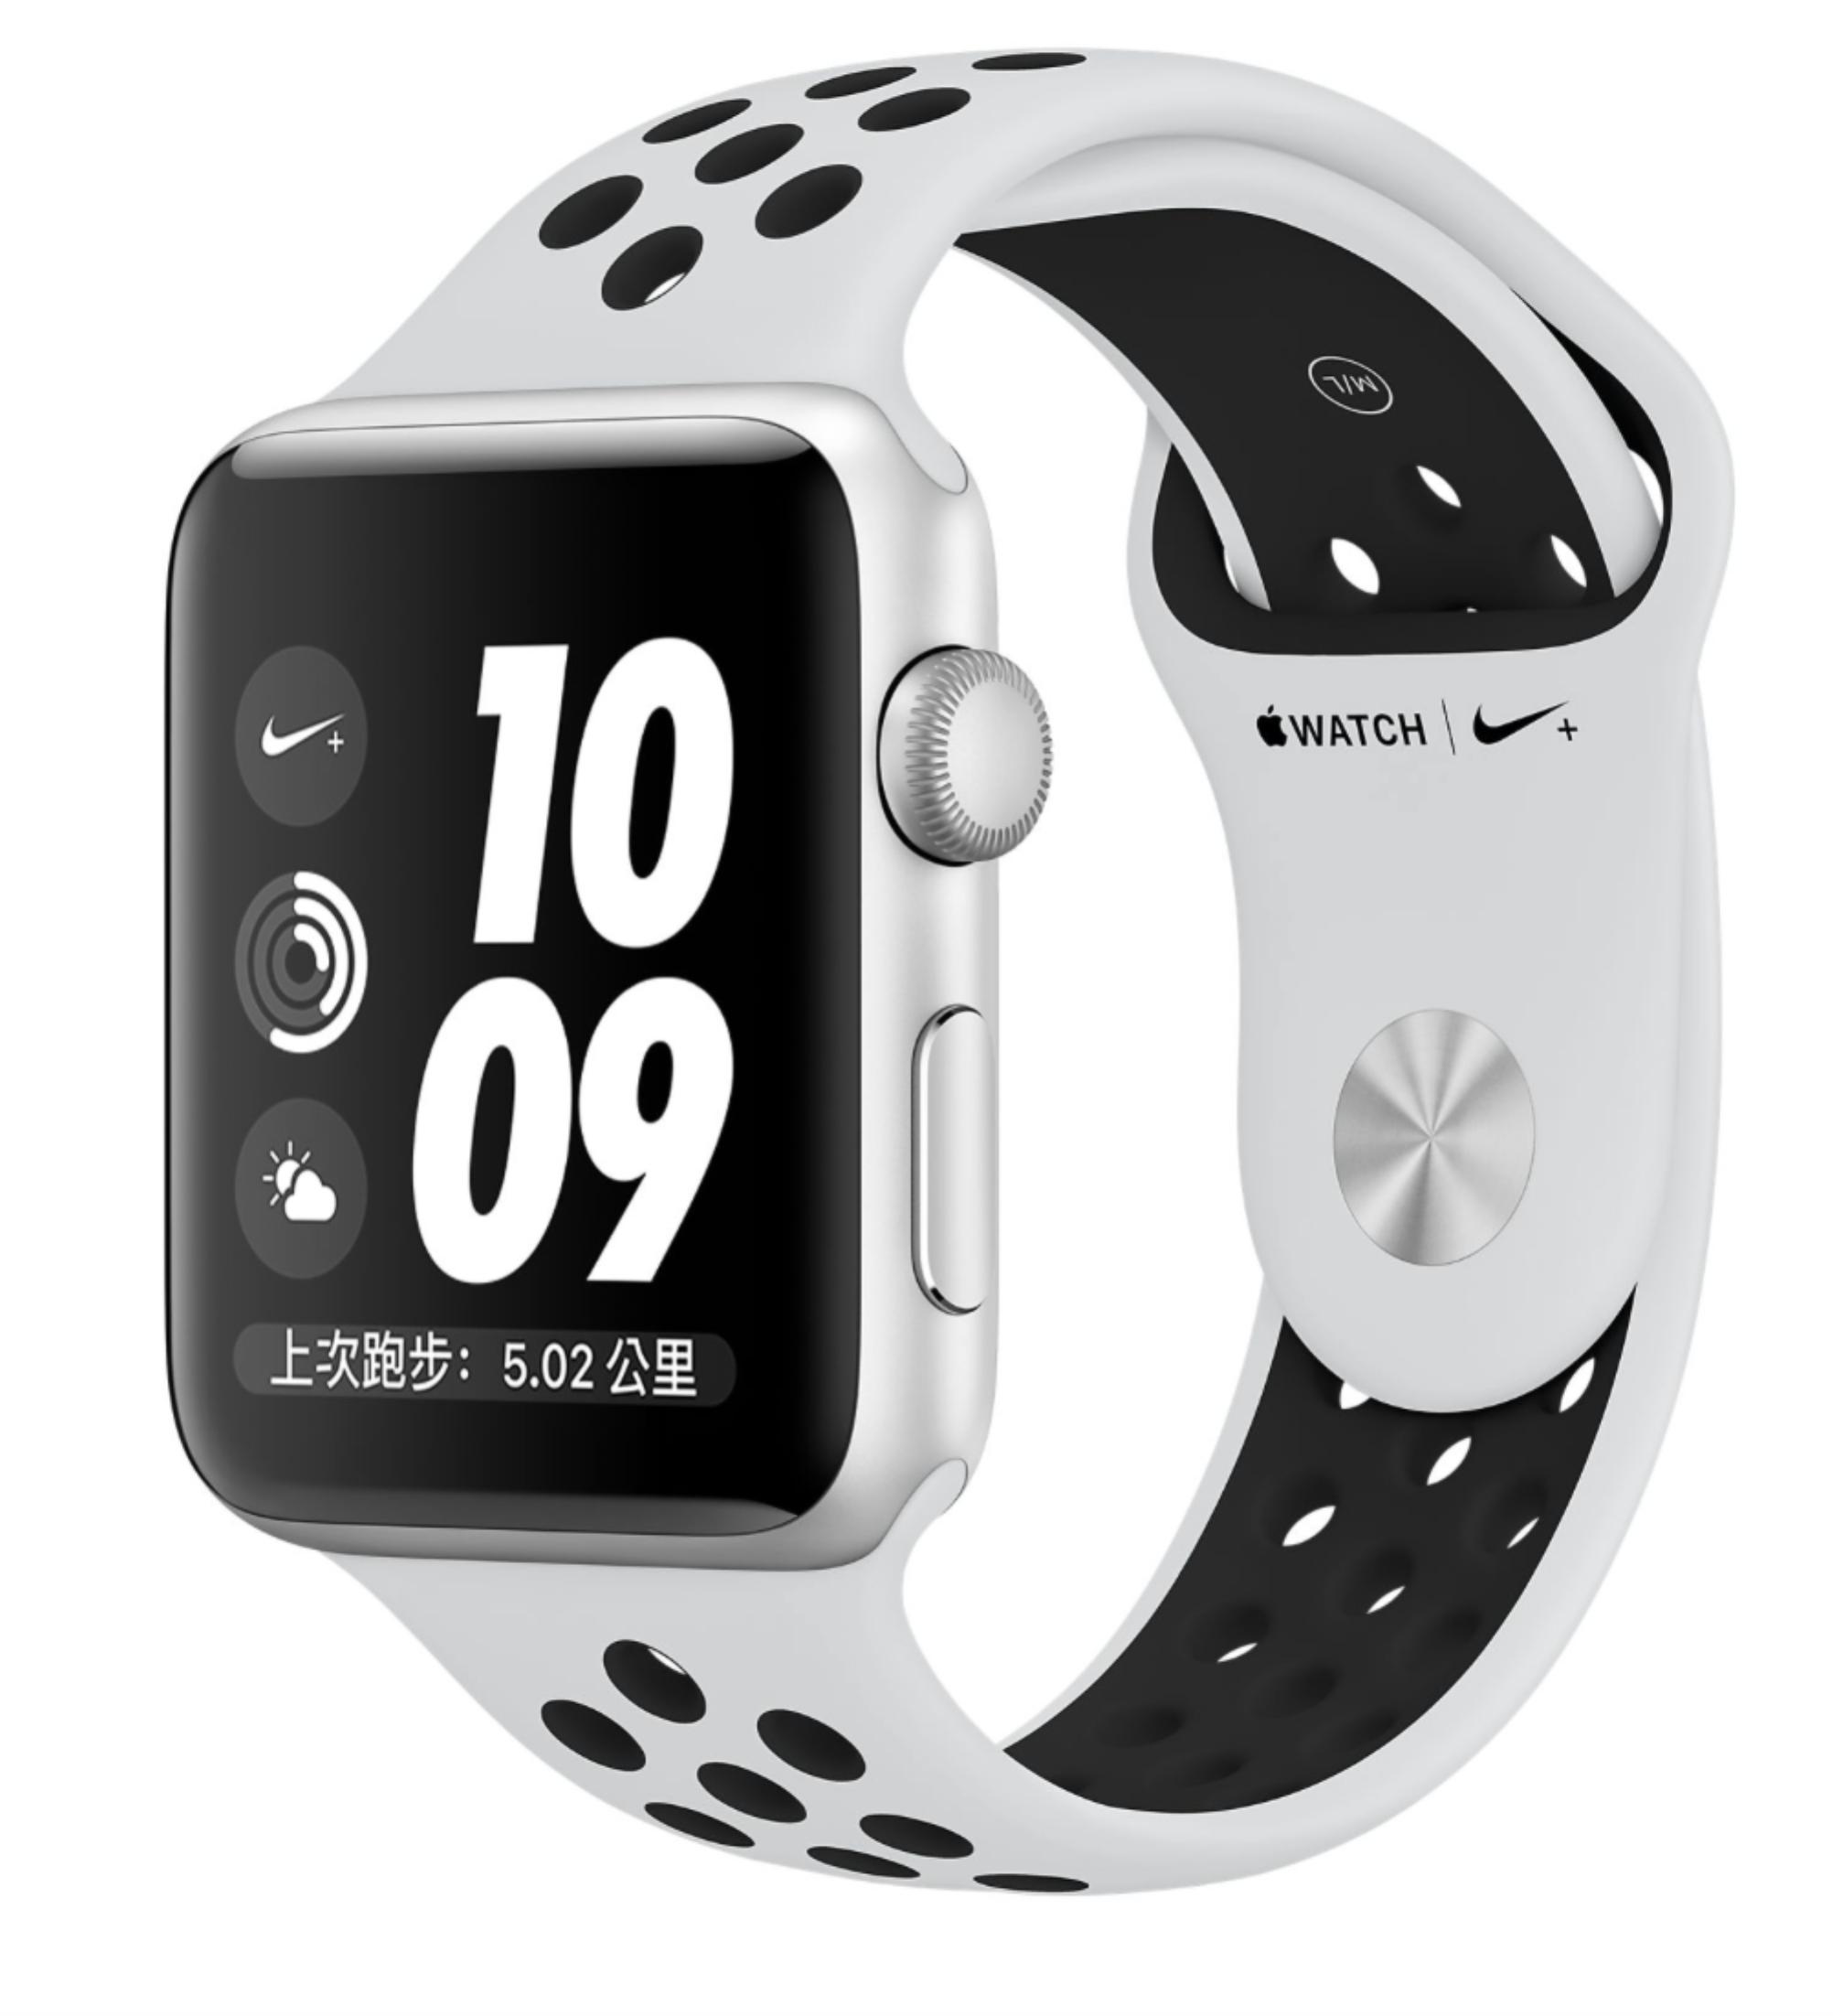 STUDIO A 情人節閃購 Apple Watch 現折 1,314 元